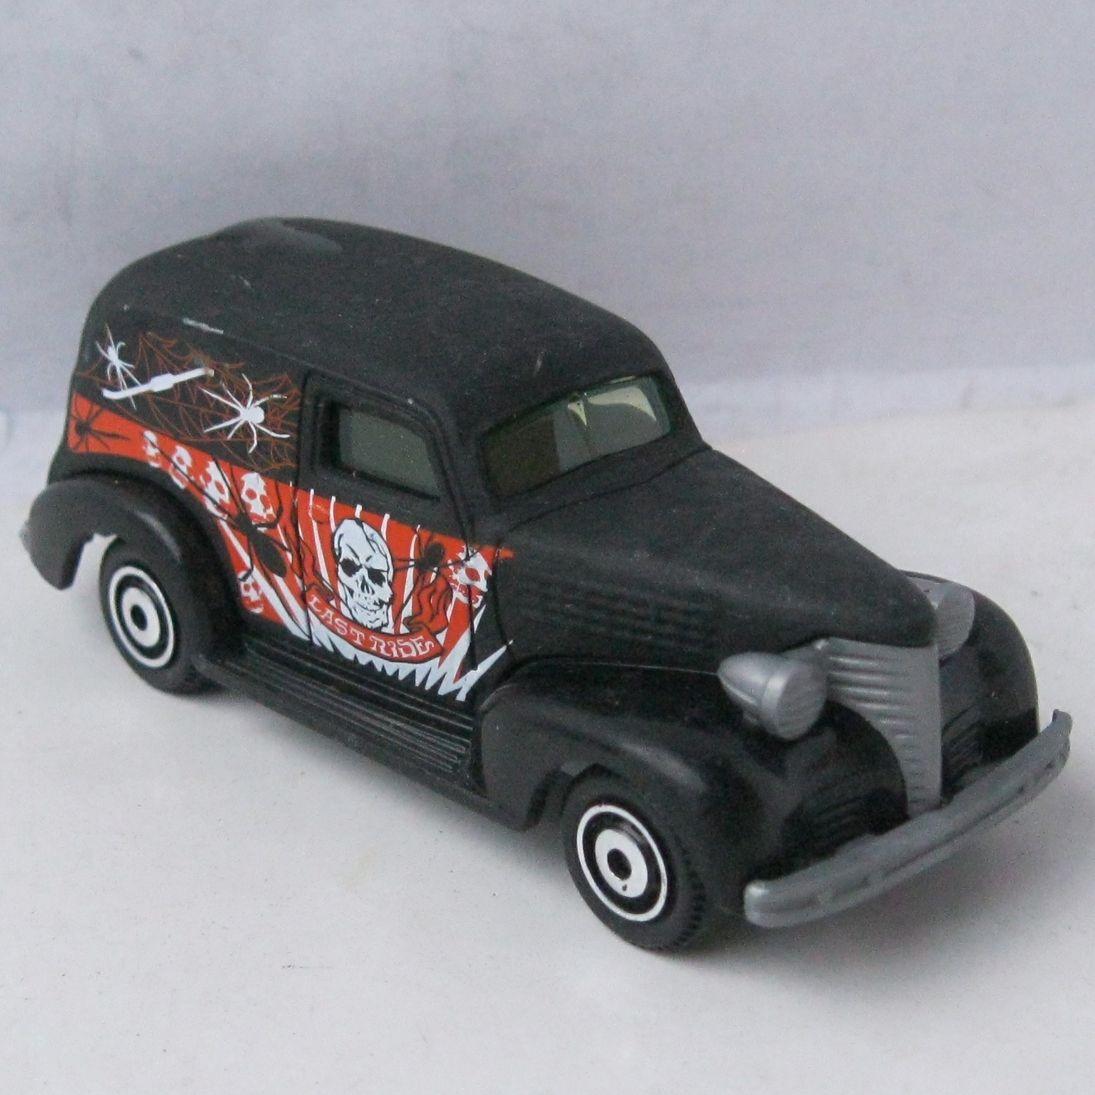 Matchbox matches box alloy car model toy mb746 1939 CHEVROLET sedan van(China (Mainland))